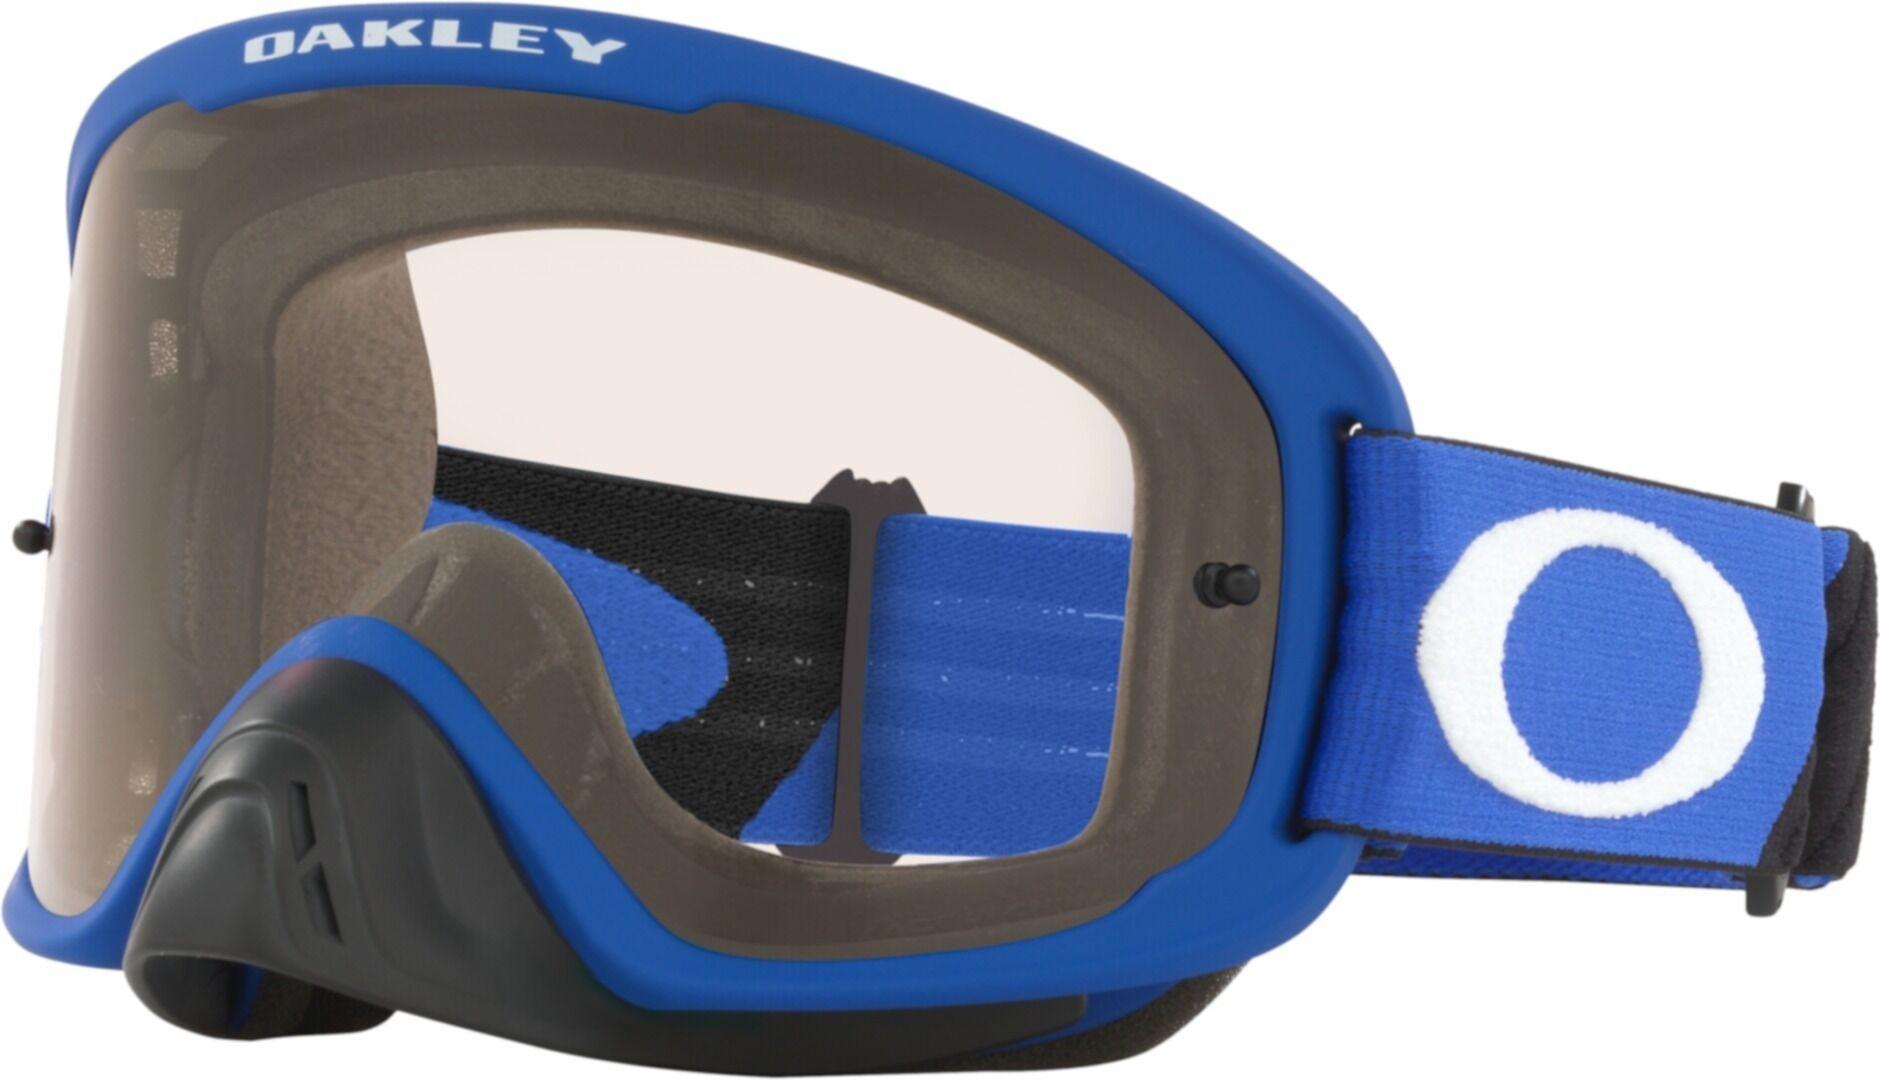 Oakley O-Frame 2.0 Pro Tuff Blocks Motocross Goggles  - Size: One Size